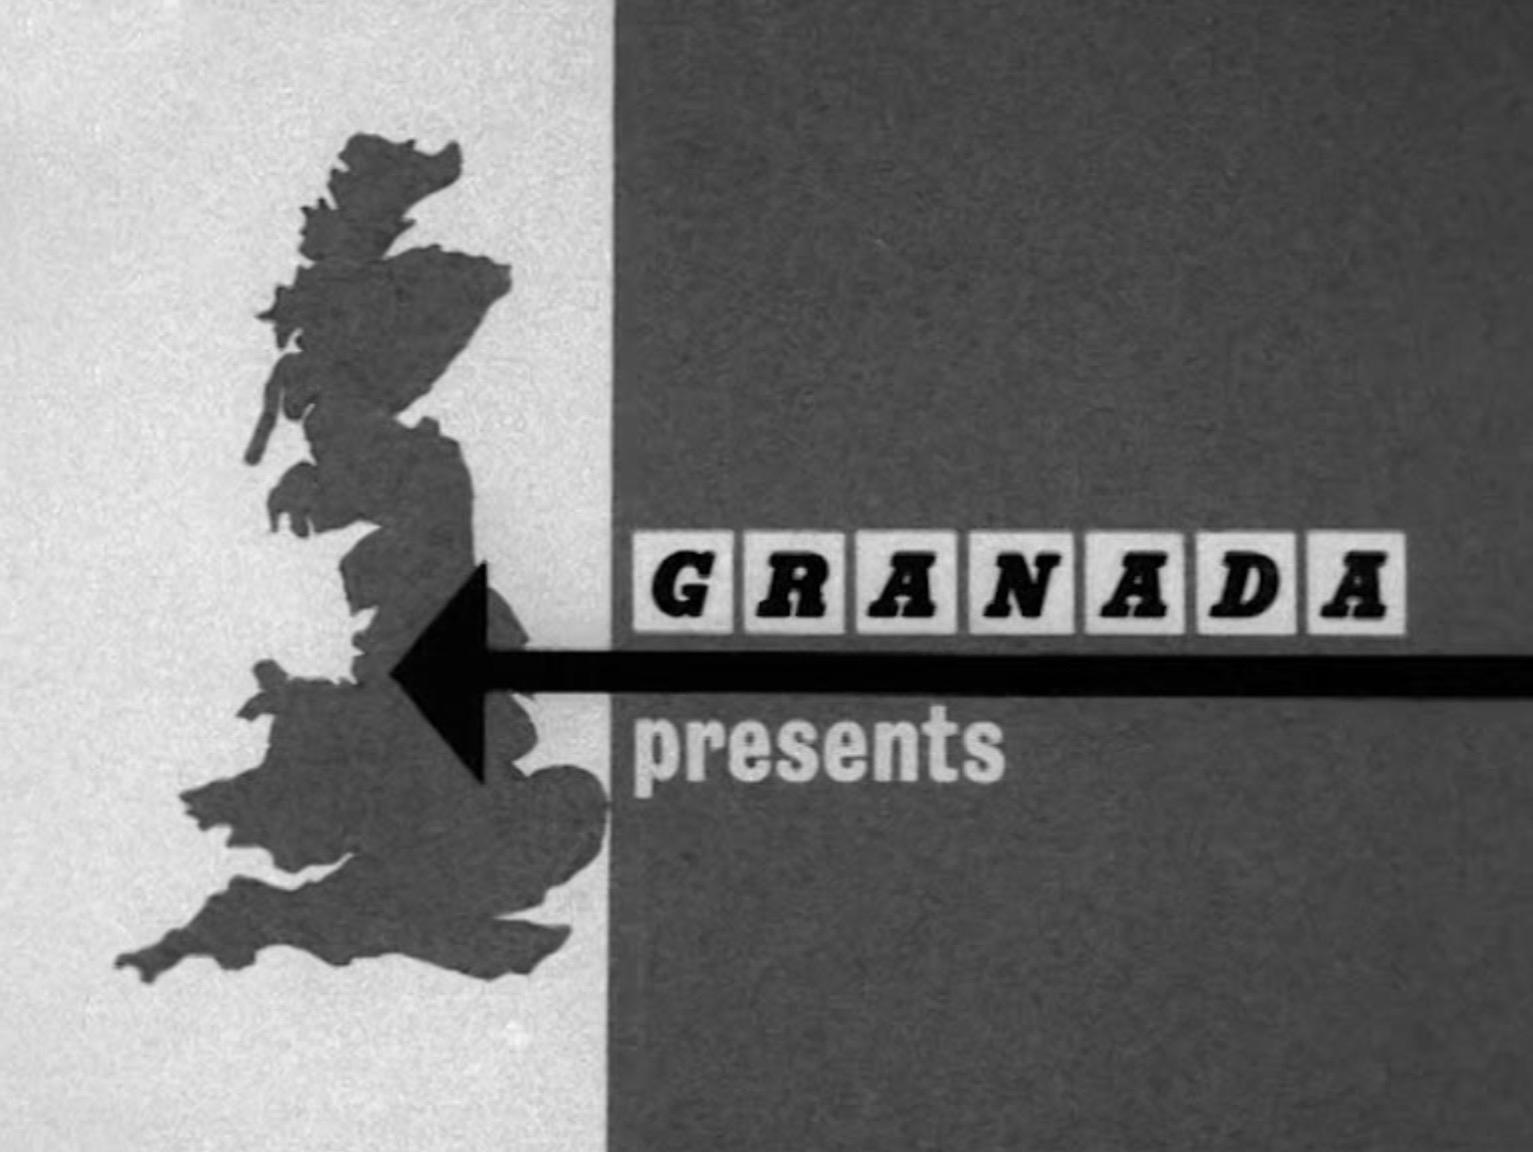 Granada International/Other